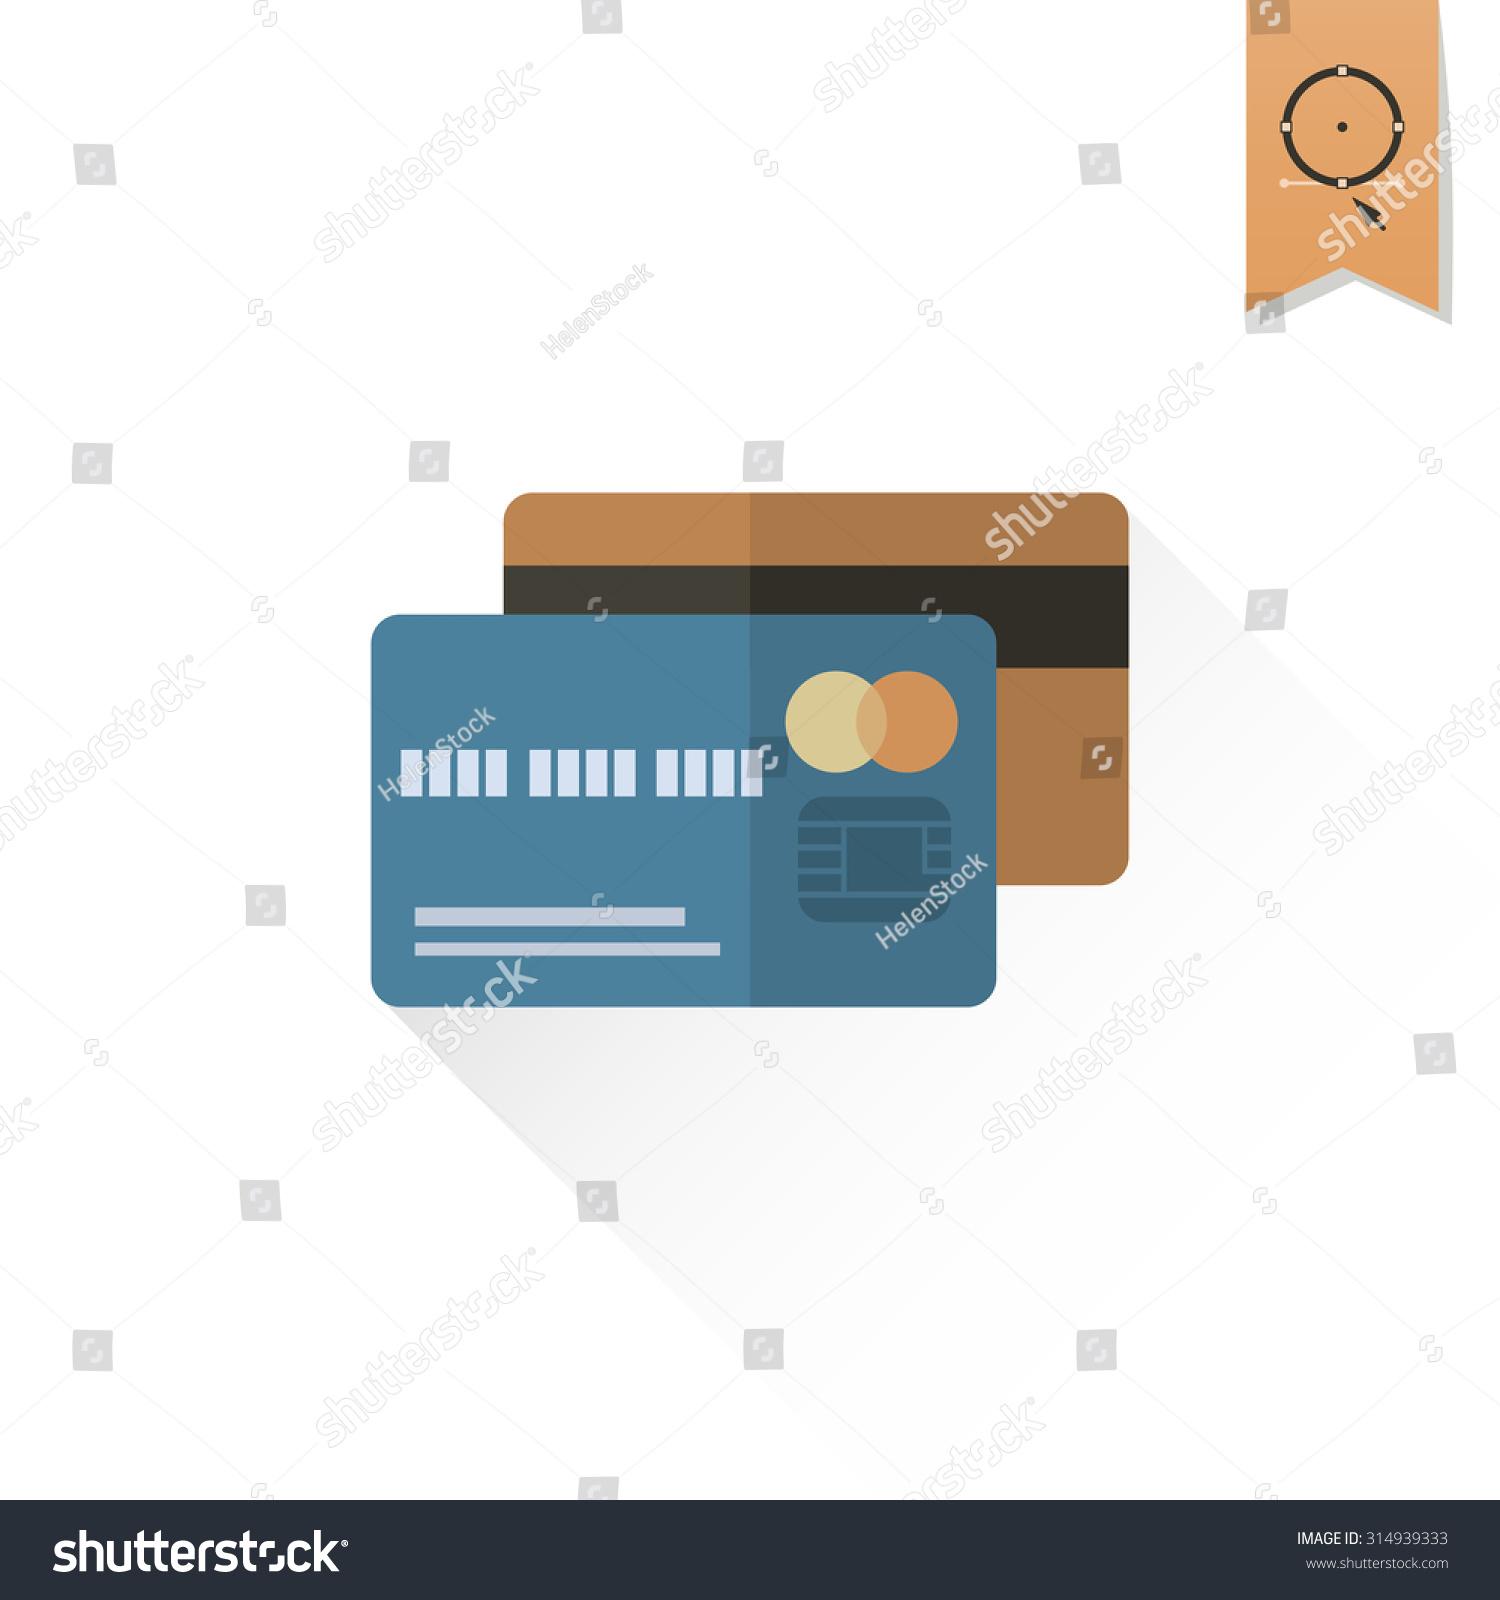 Credit Card Business Finance Single Flat Stock Illustration ...